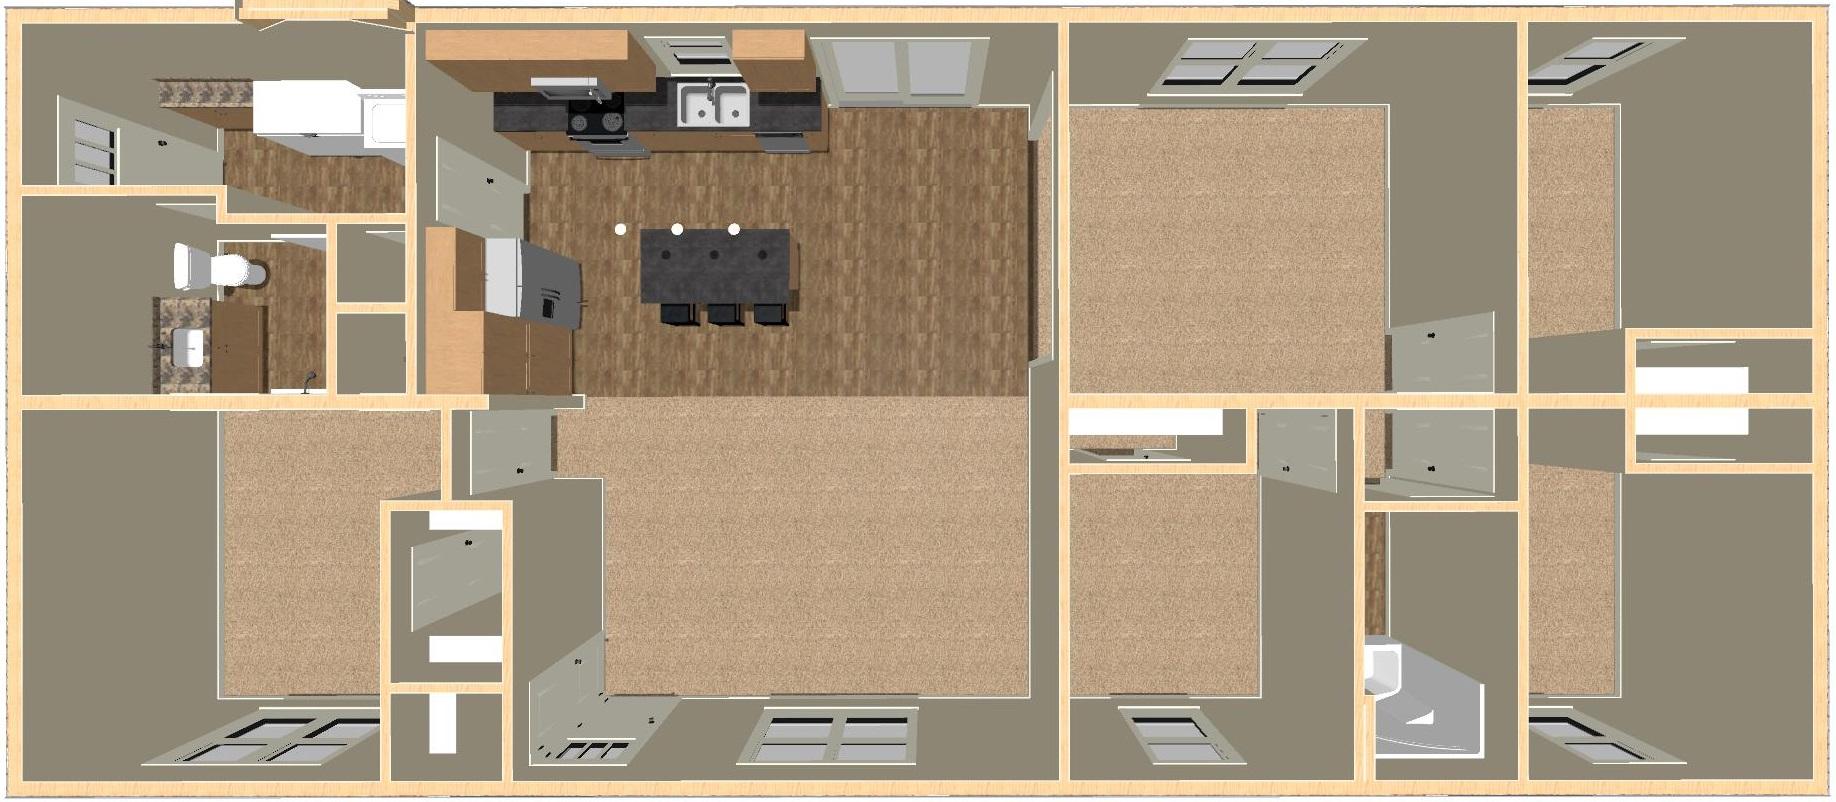 Keokuk | 1,728 Square Foot | 27' x 64'